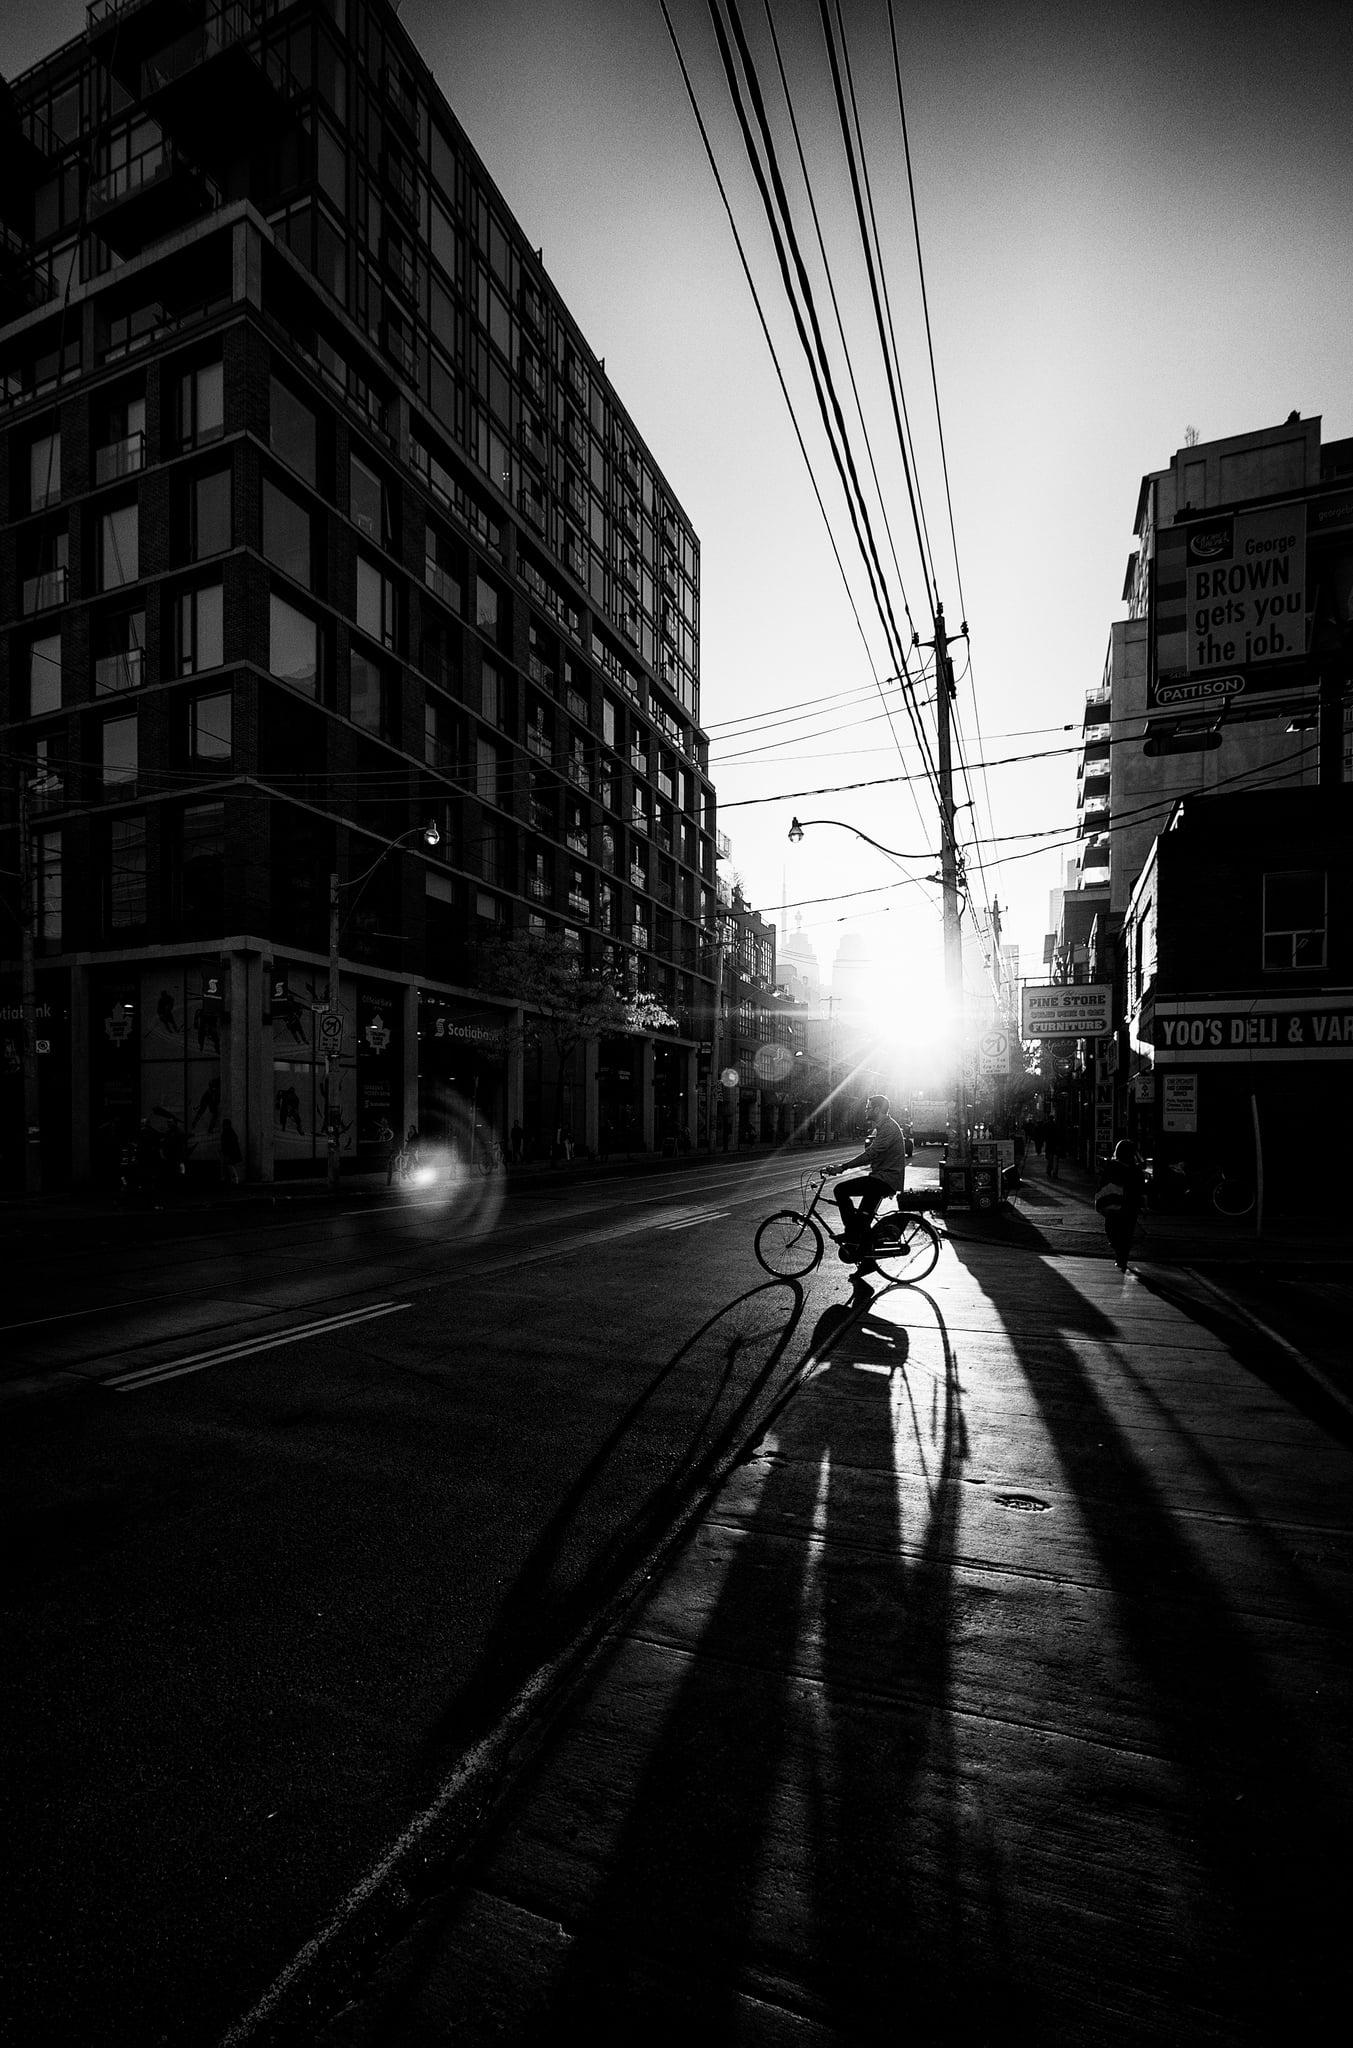 cyclist-shadow_torontohendge_highcon_bw_01.jpg